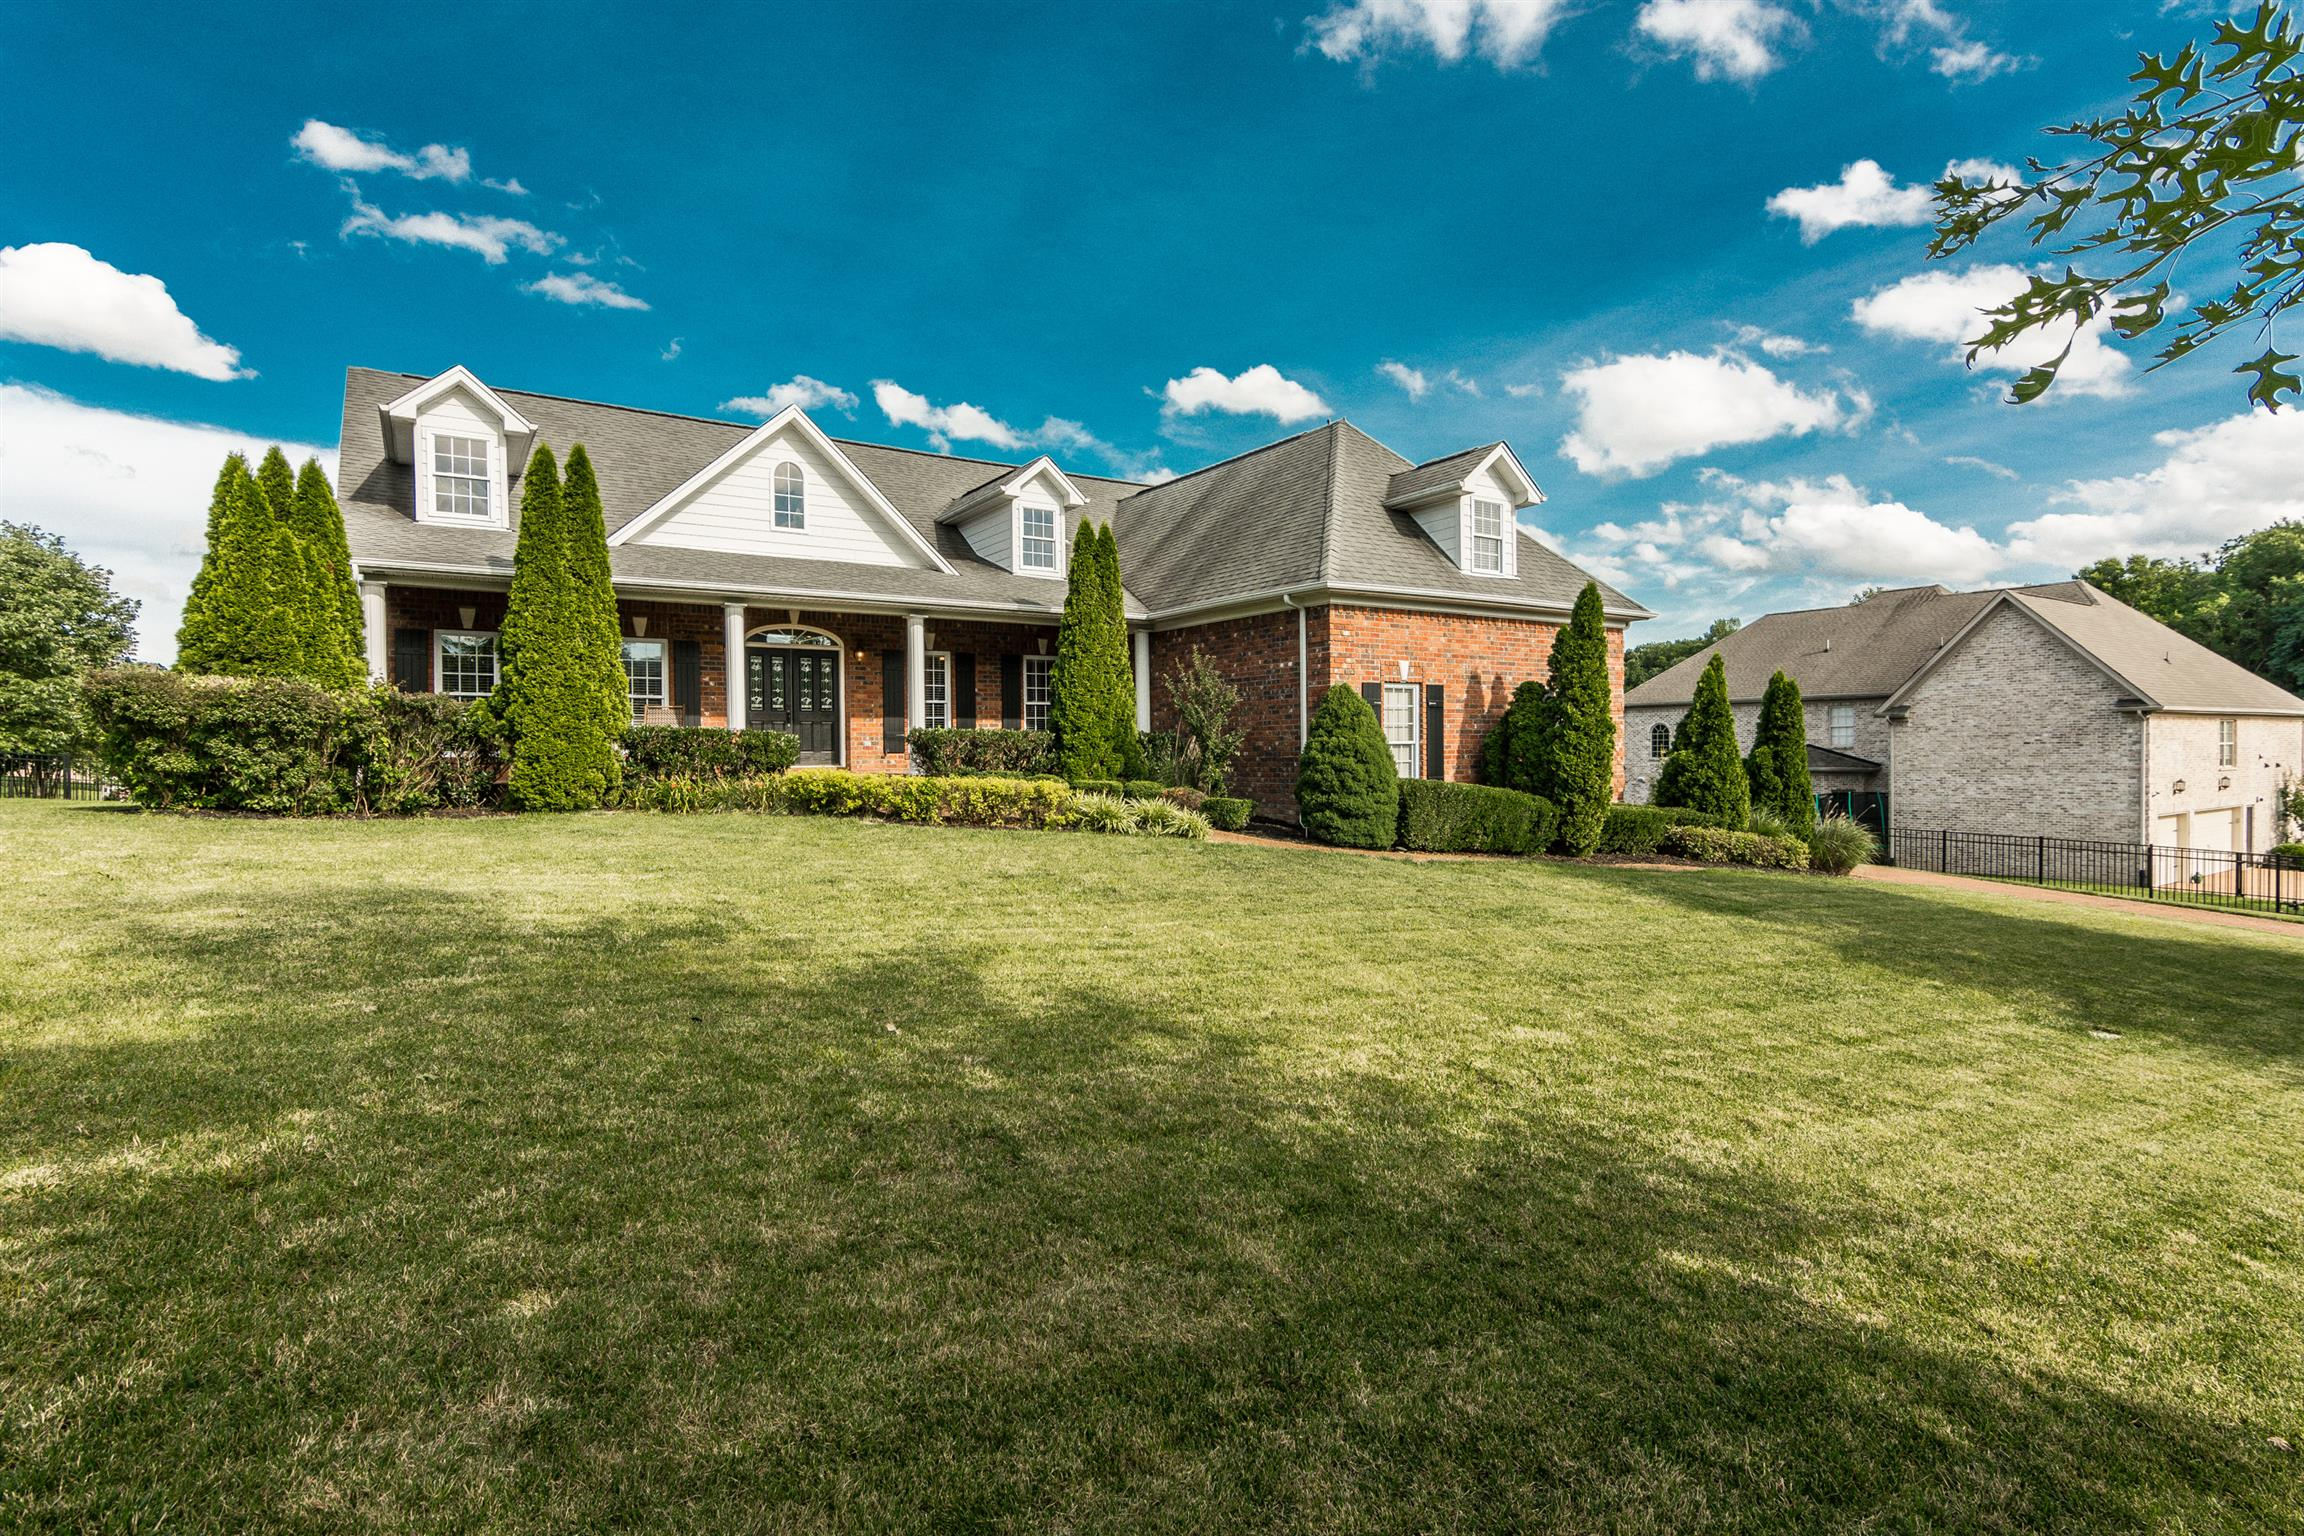 1002 Redwood Way, Hendersonville, TN 37075 - Hendersonville, TN real estate listing